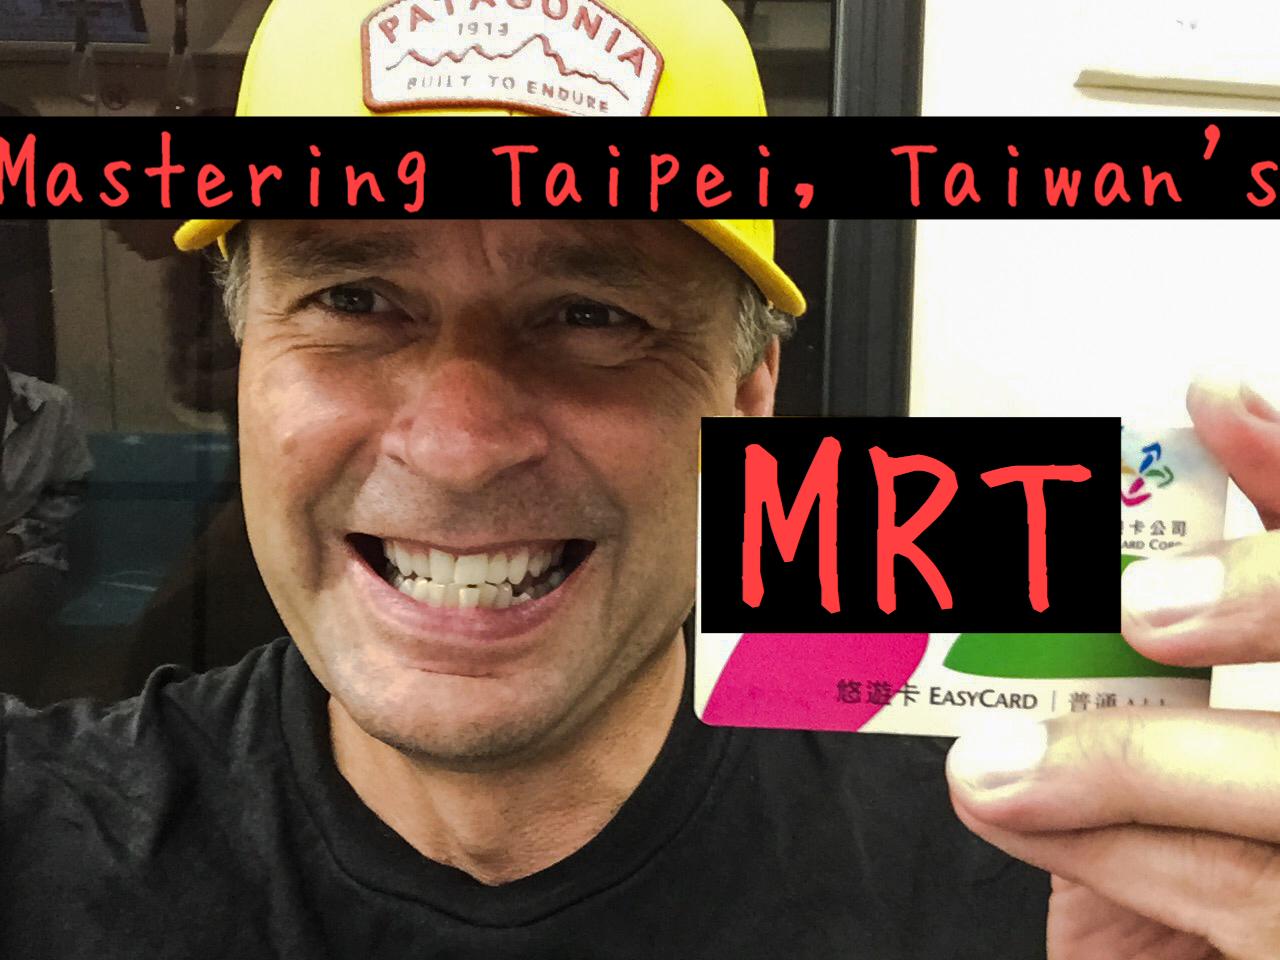 Artwork for Mastering Taipei, Taiwan's MRT(Mass Rapid Transit)System